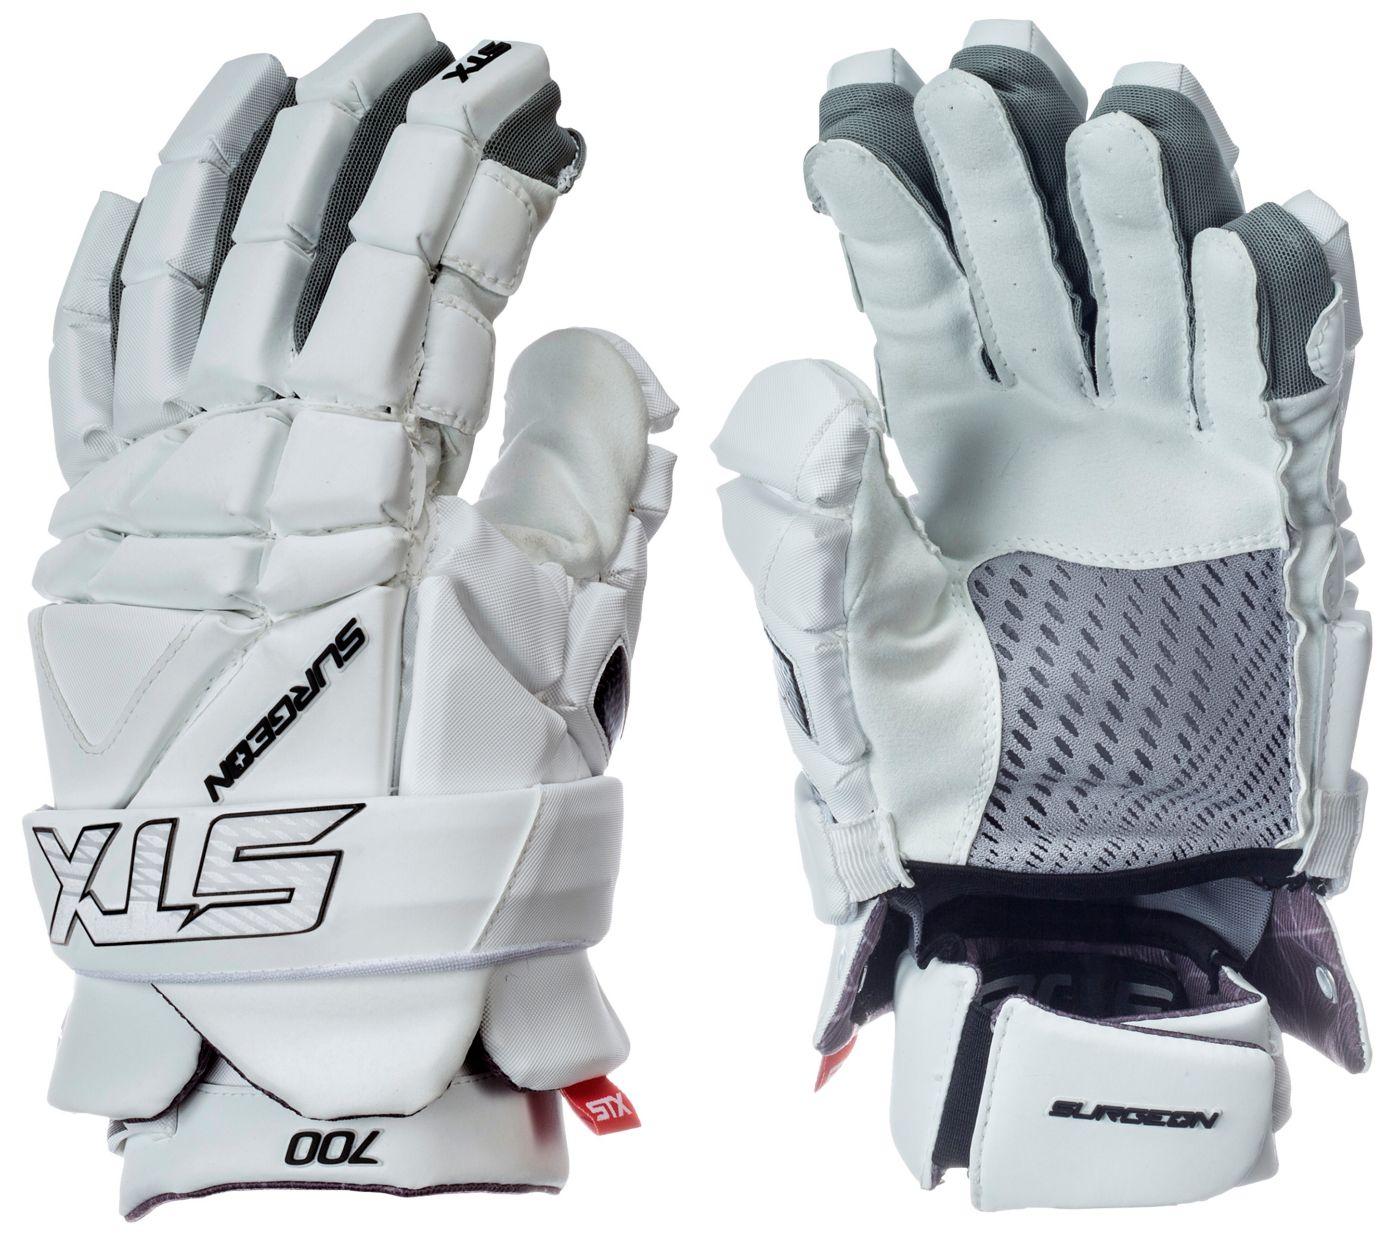 STX Men's Surgeon 700 Lacrosse Gloves